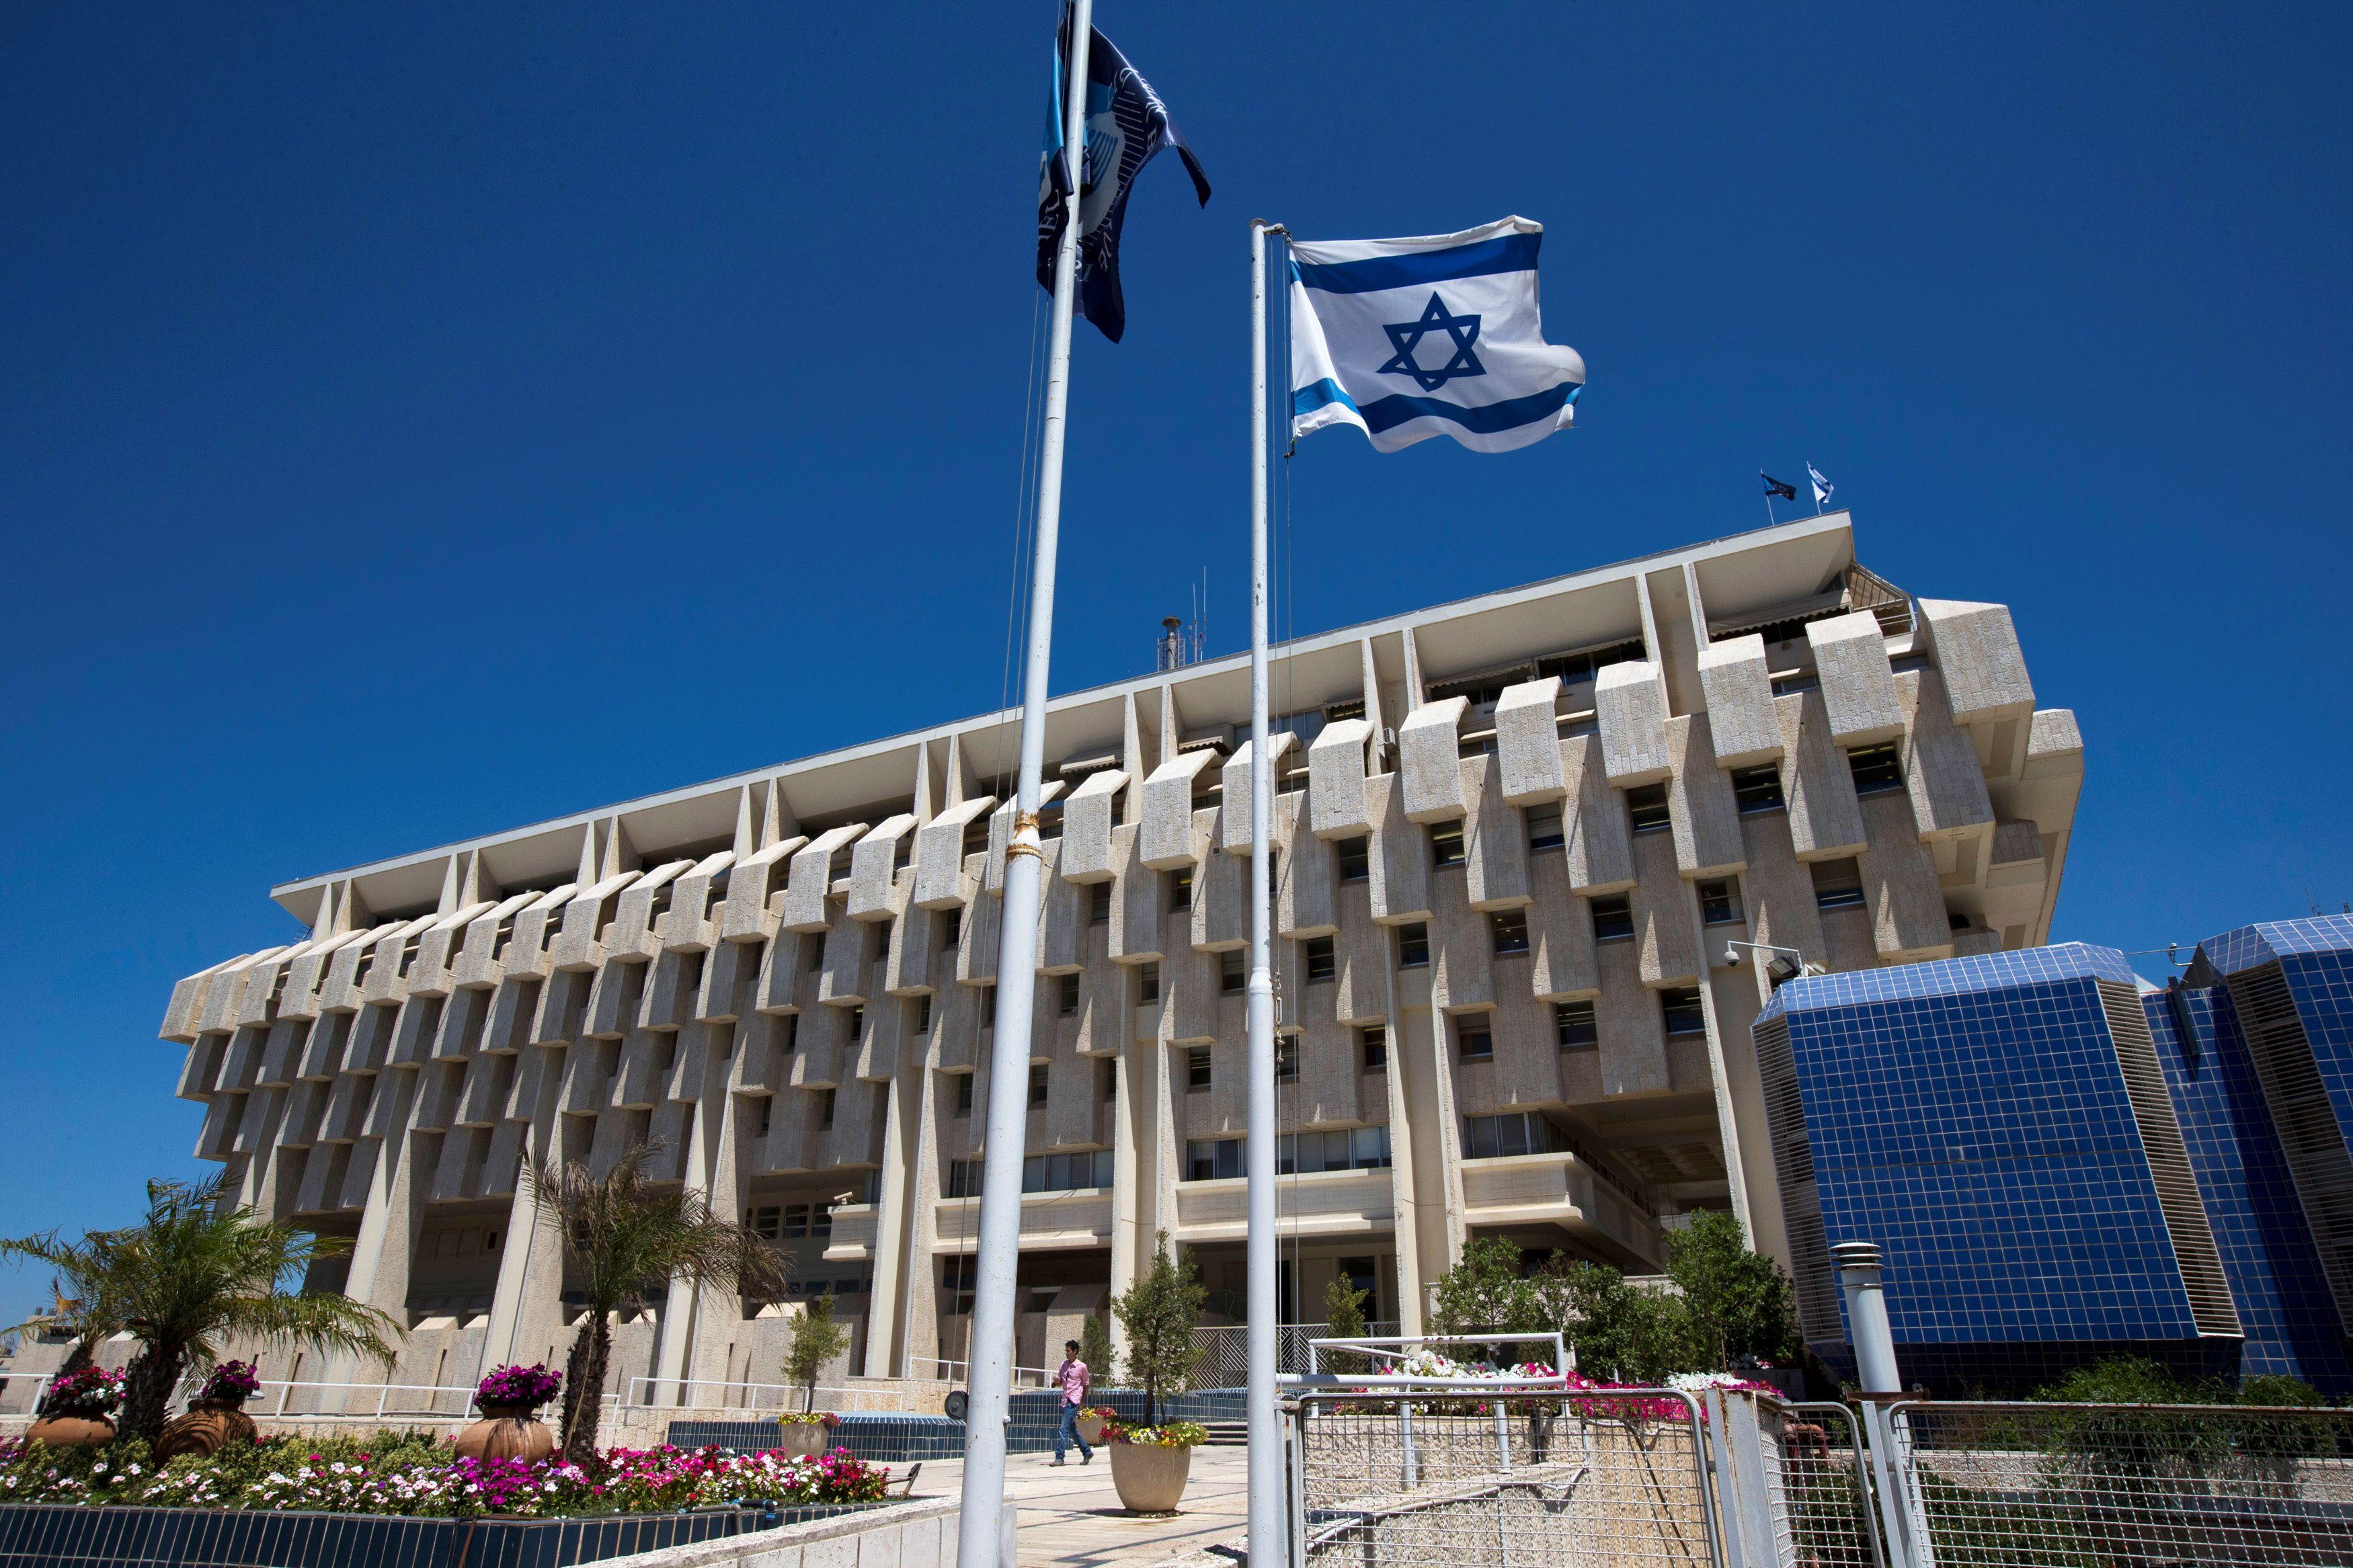 An Israeli flag flutters outside the Bank of Israel building in Jerusalem August 7, 2013.. REUTERS/Ronen Zvulun/File Photo